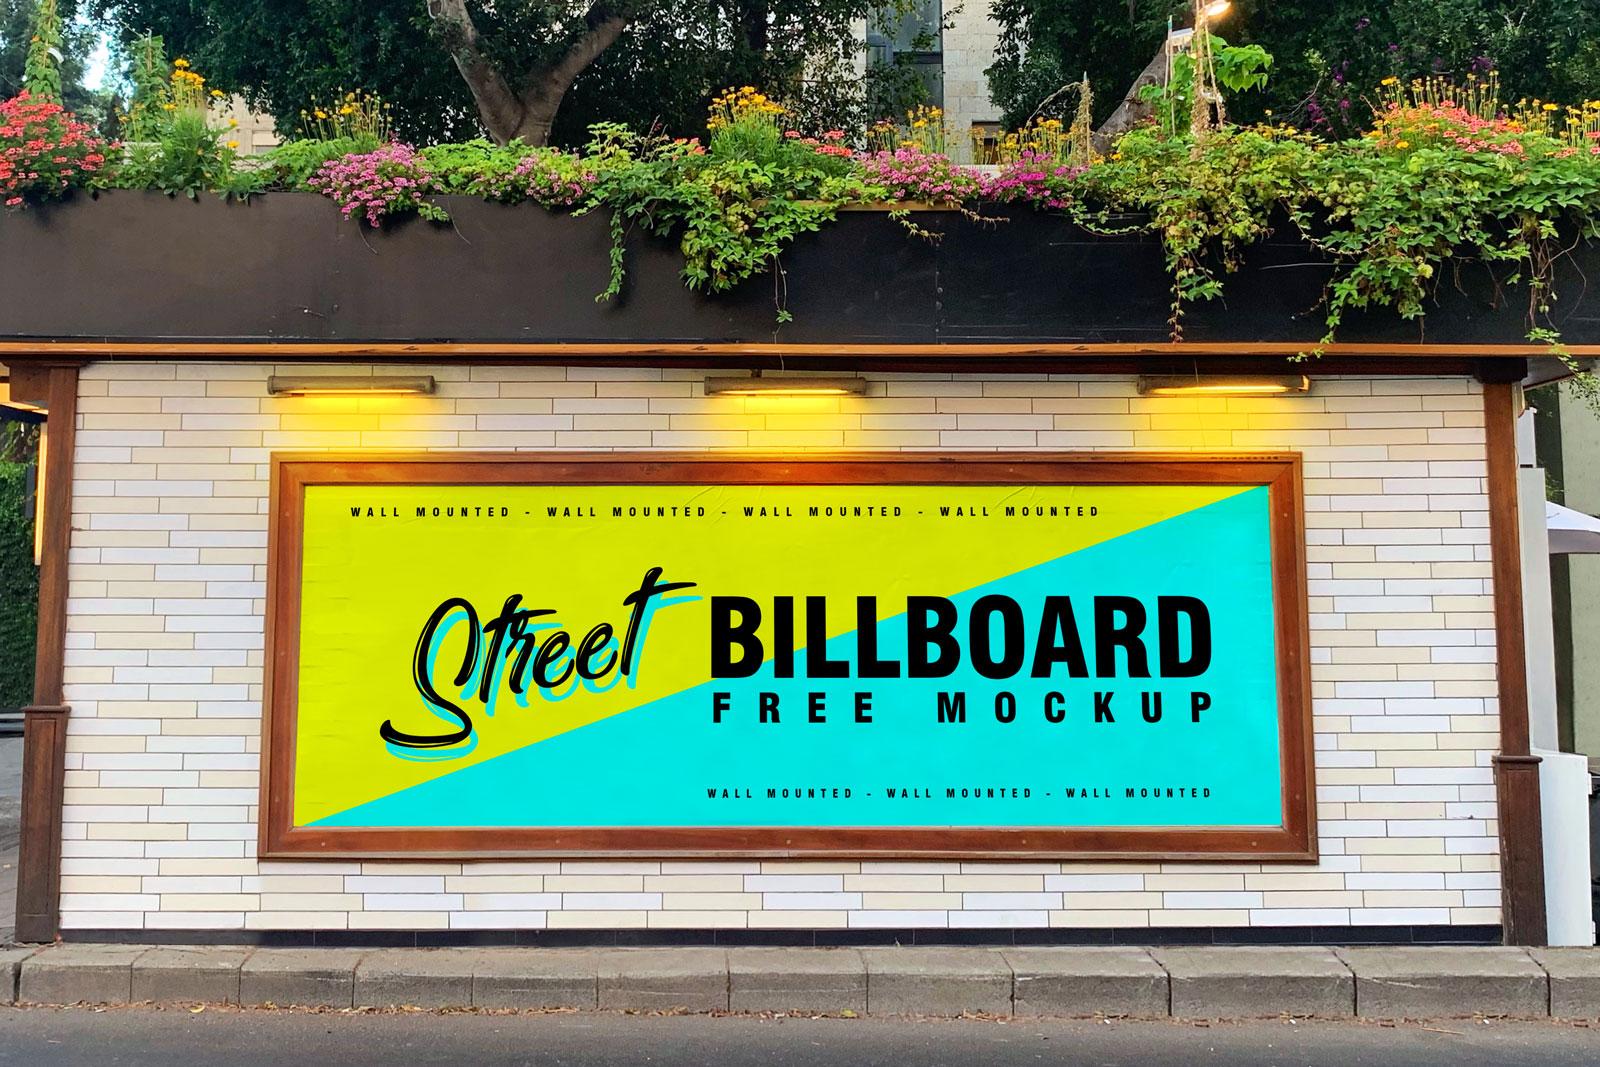 Street Wall Mounted Billboard Free Mockup